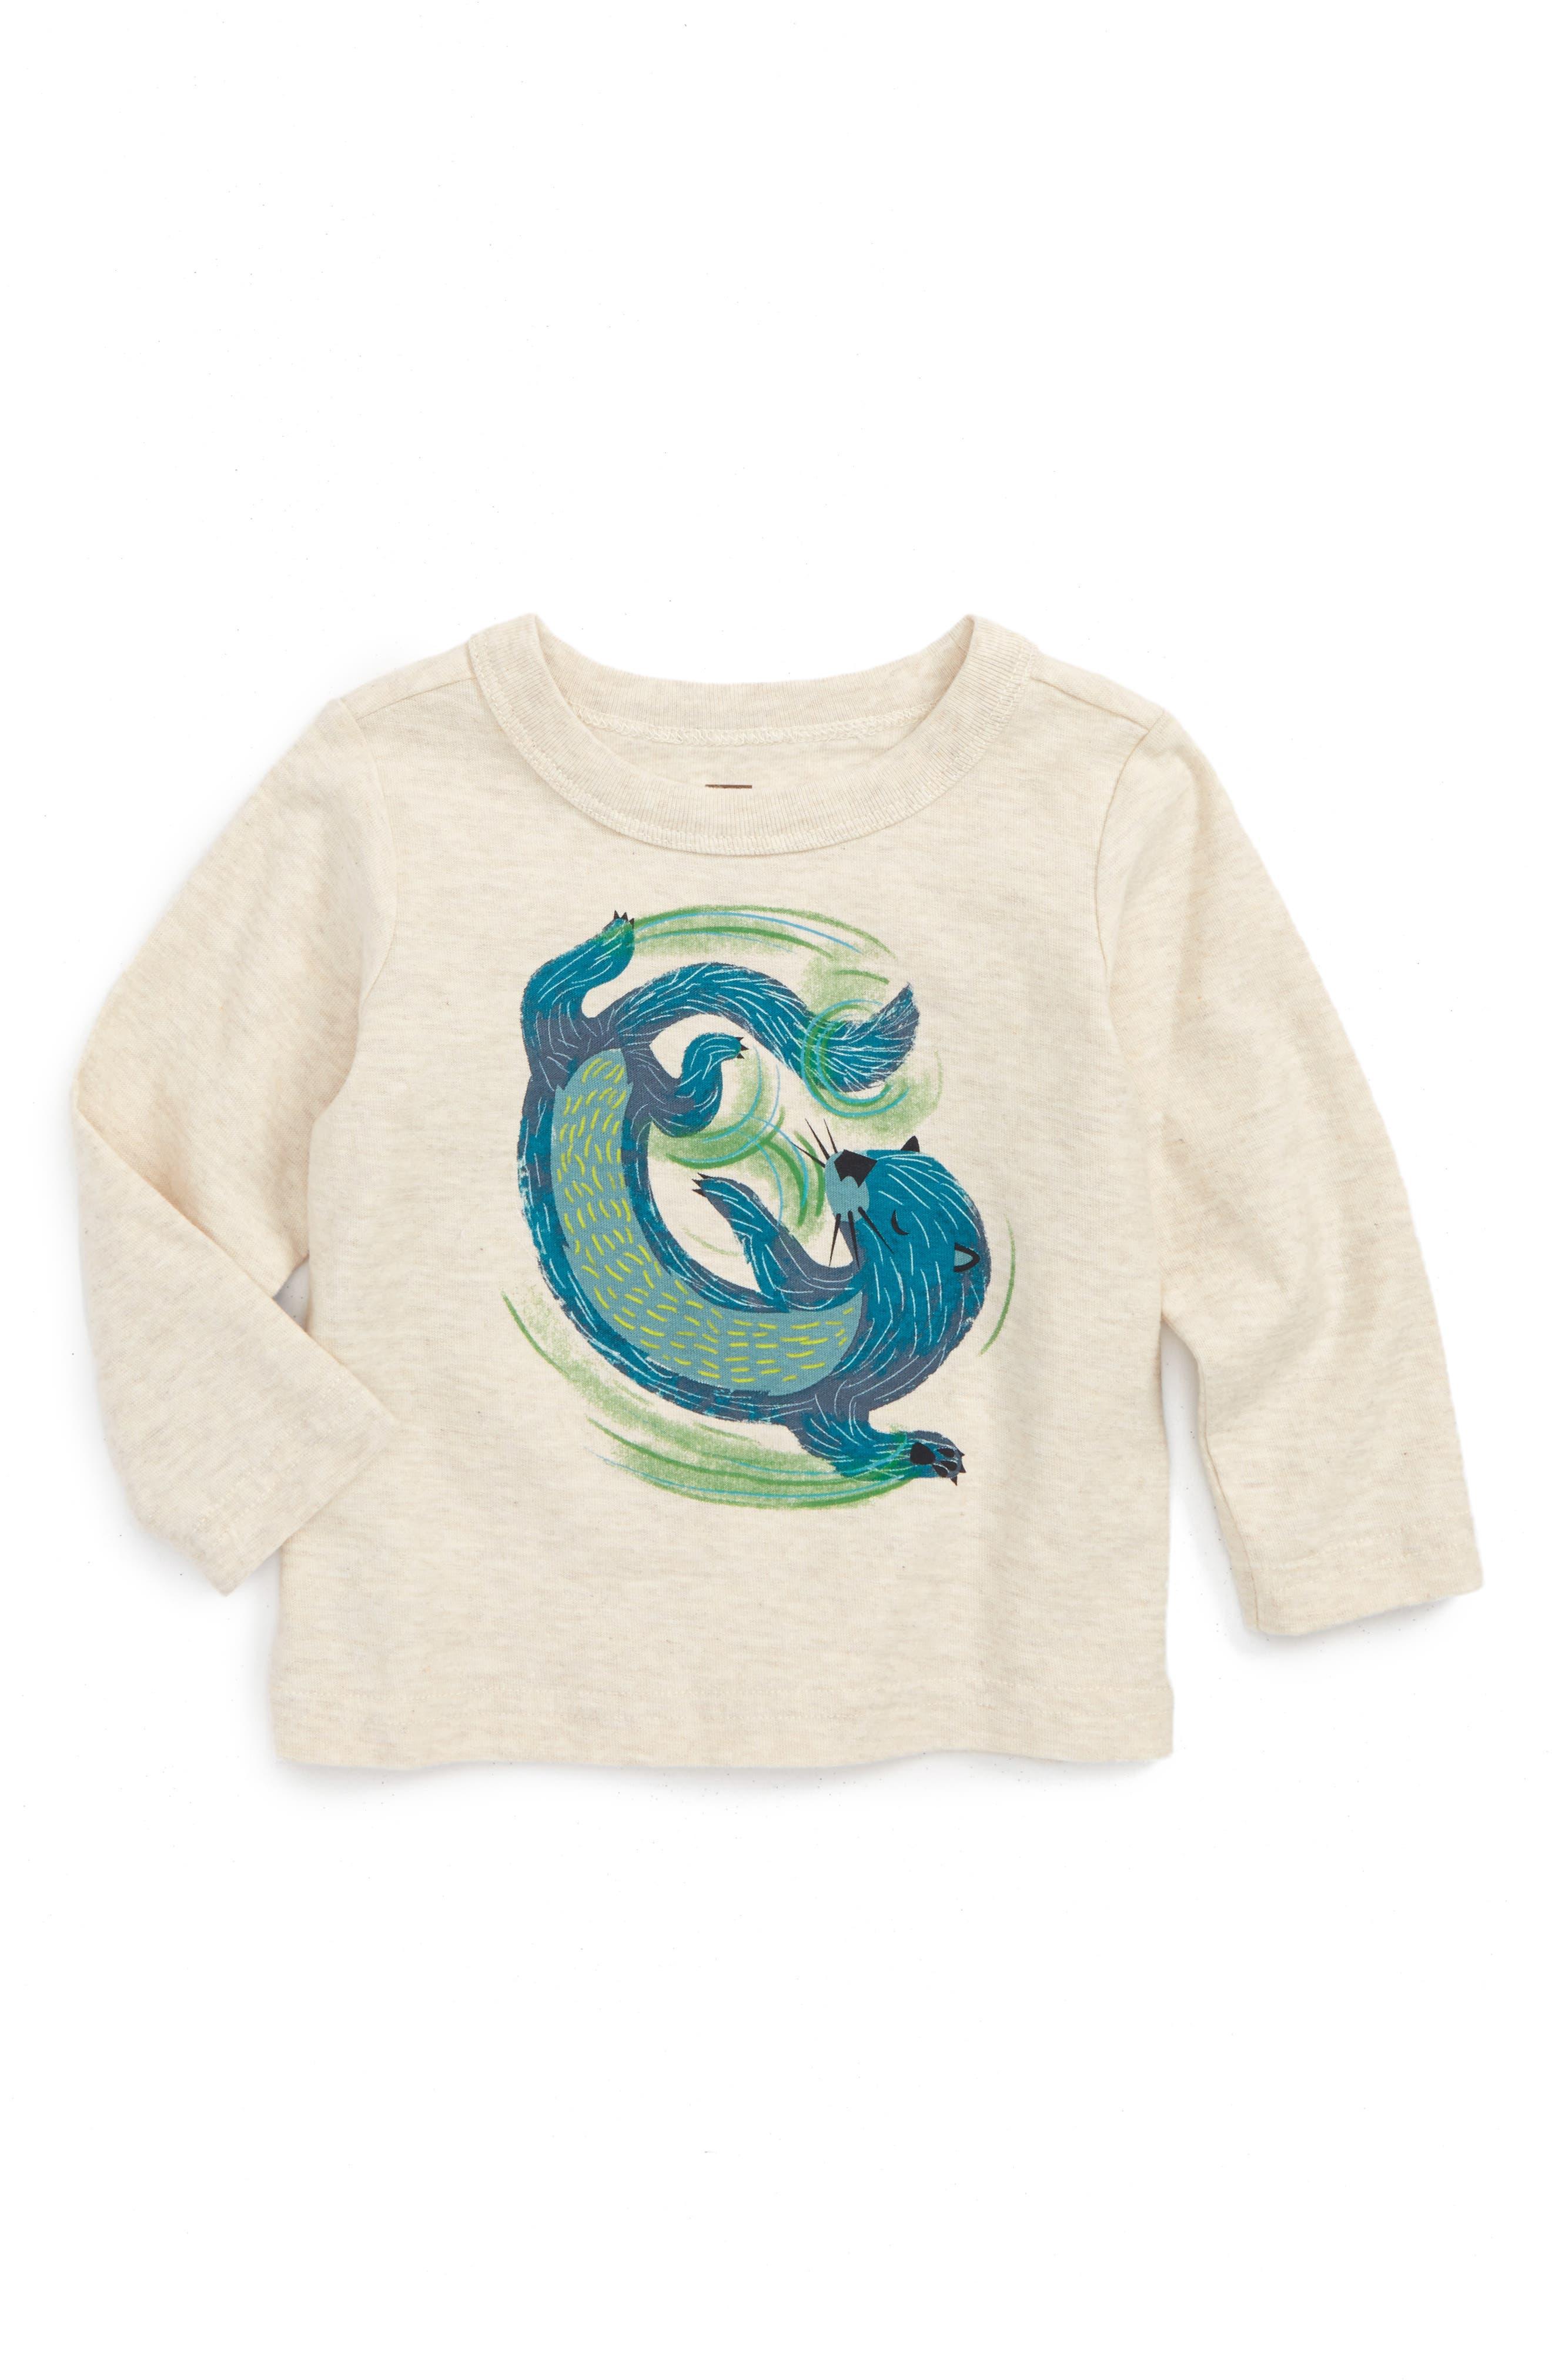 River Otter Graphic T-Shirt,                             Main thumbnail 1, color,                             280